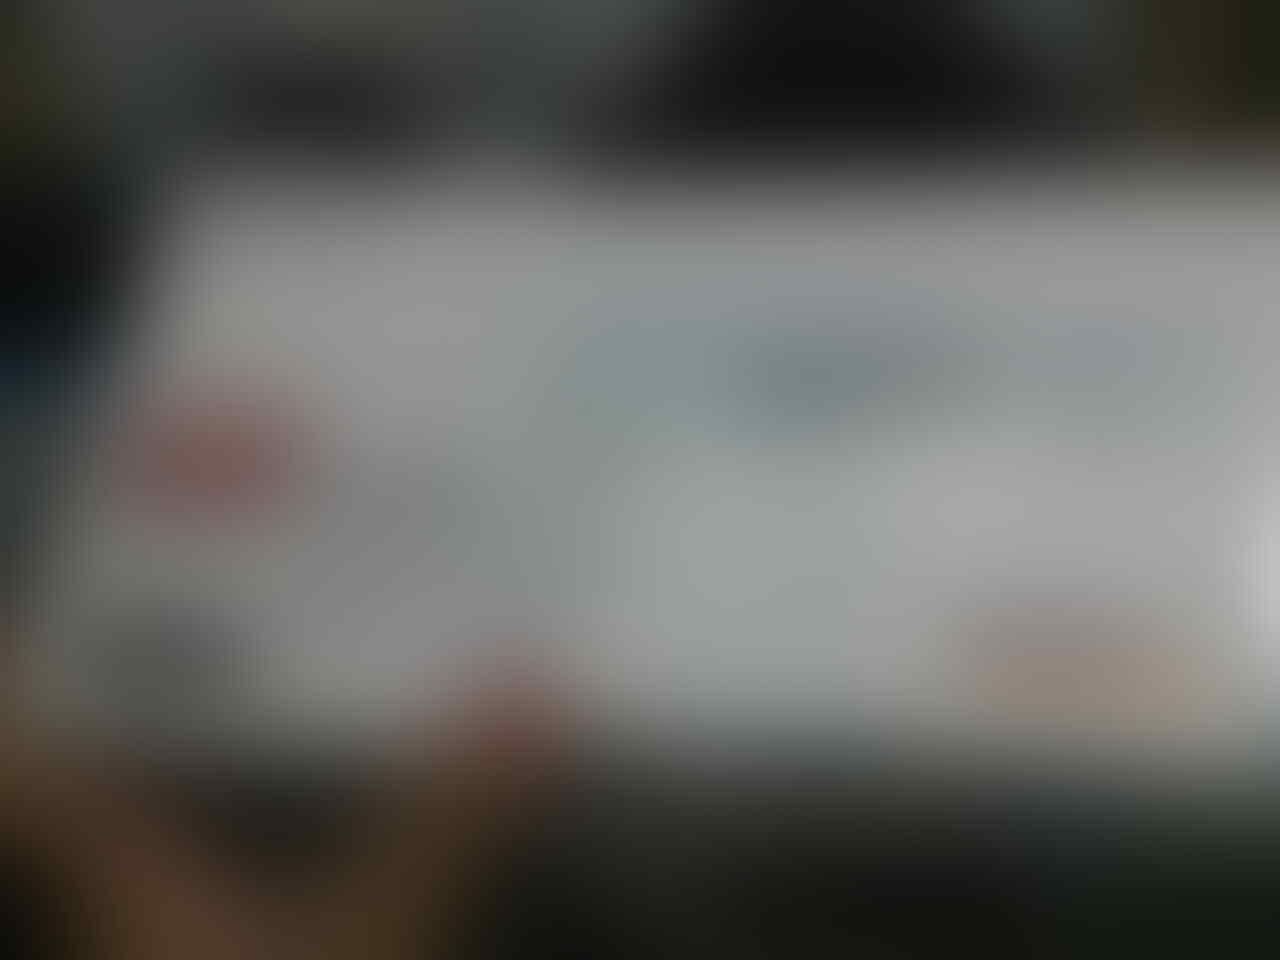 WTS ps3 160GB+BD GT5 garansi resmi sony